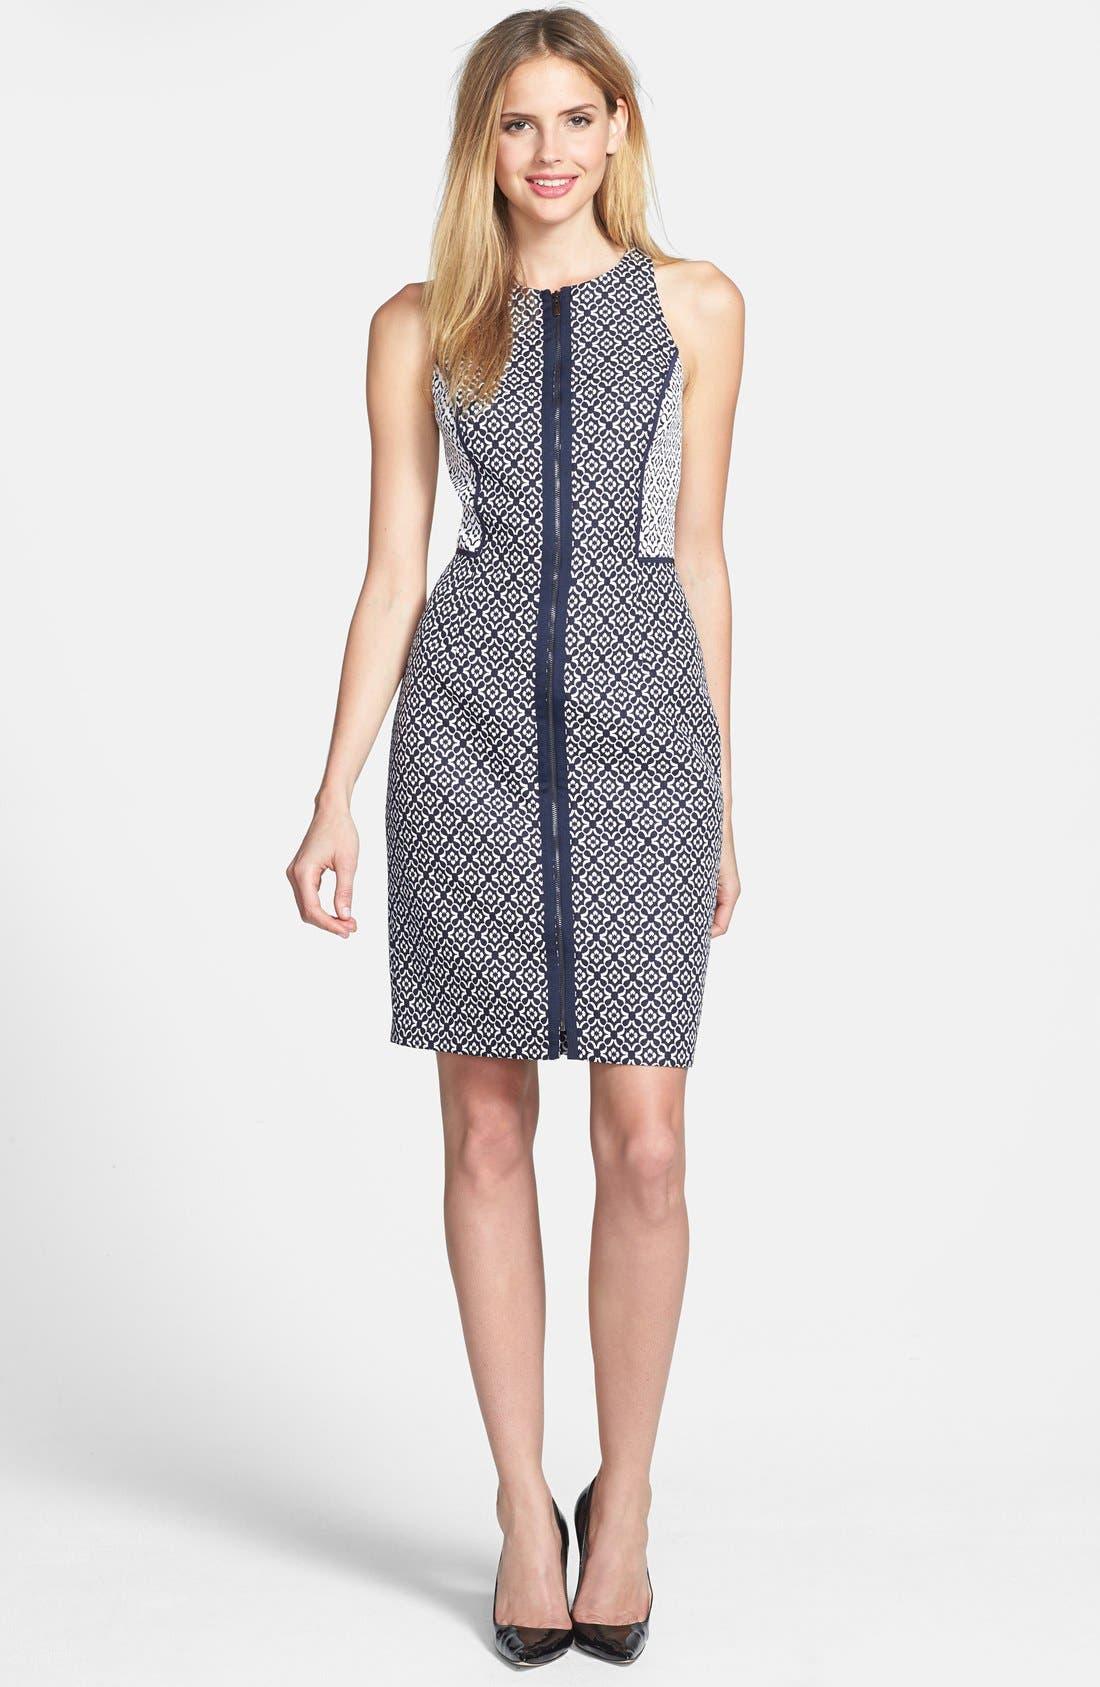 Alternate Image 1 Selected - Laundry by Shelli Segal Front Zip Jacquard Sheath Dress